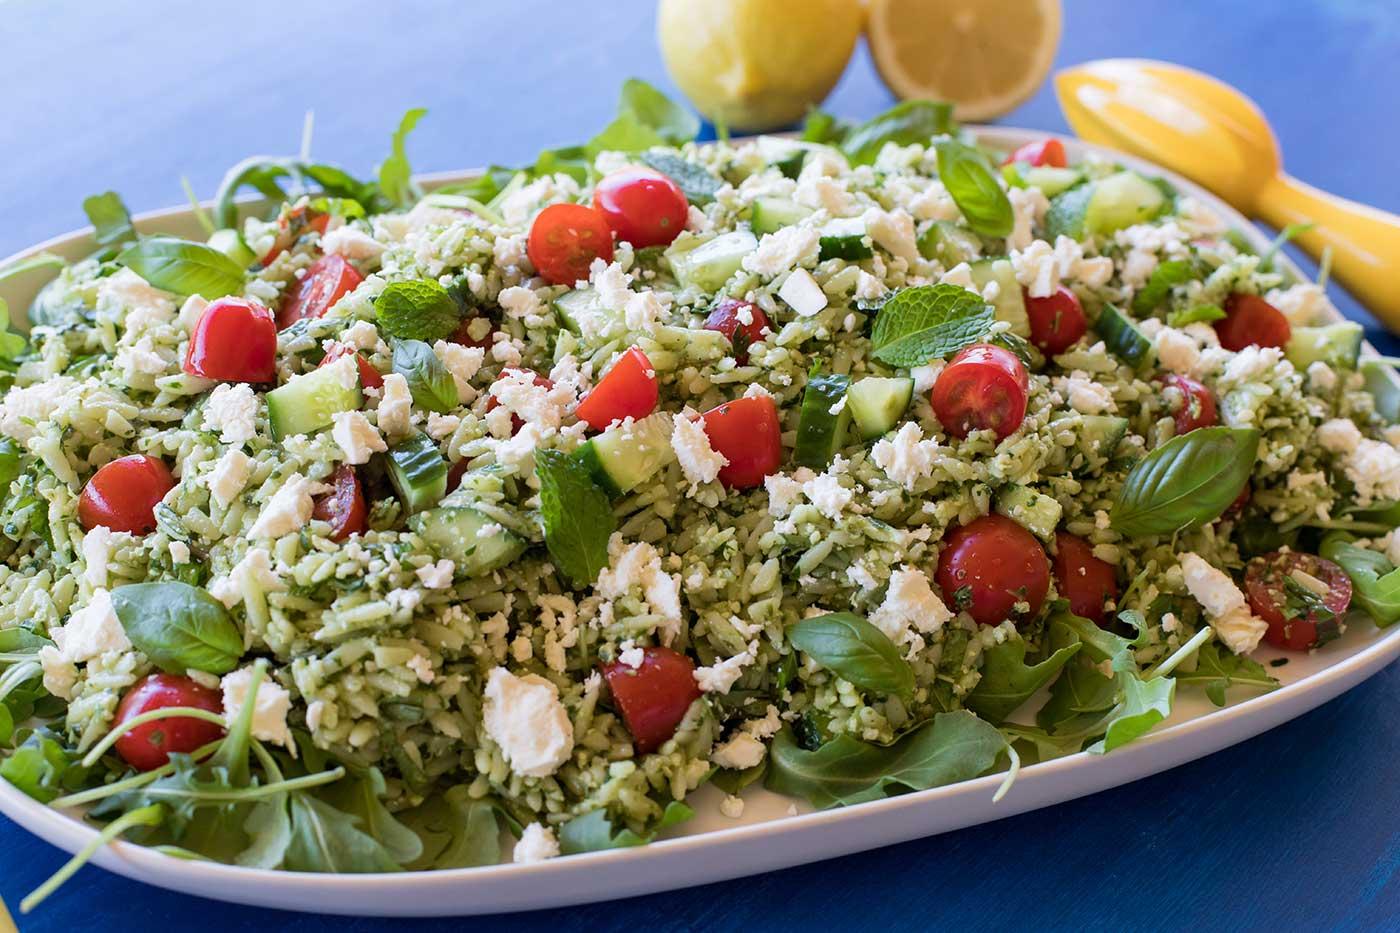 Lemon-and-Herb-Pesto-Risoni-Salad-Thermomix-Recipe